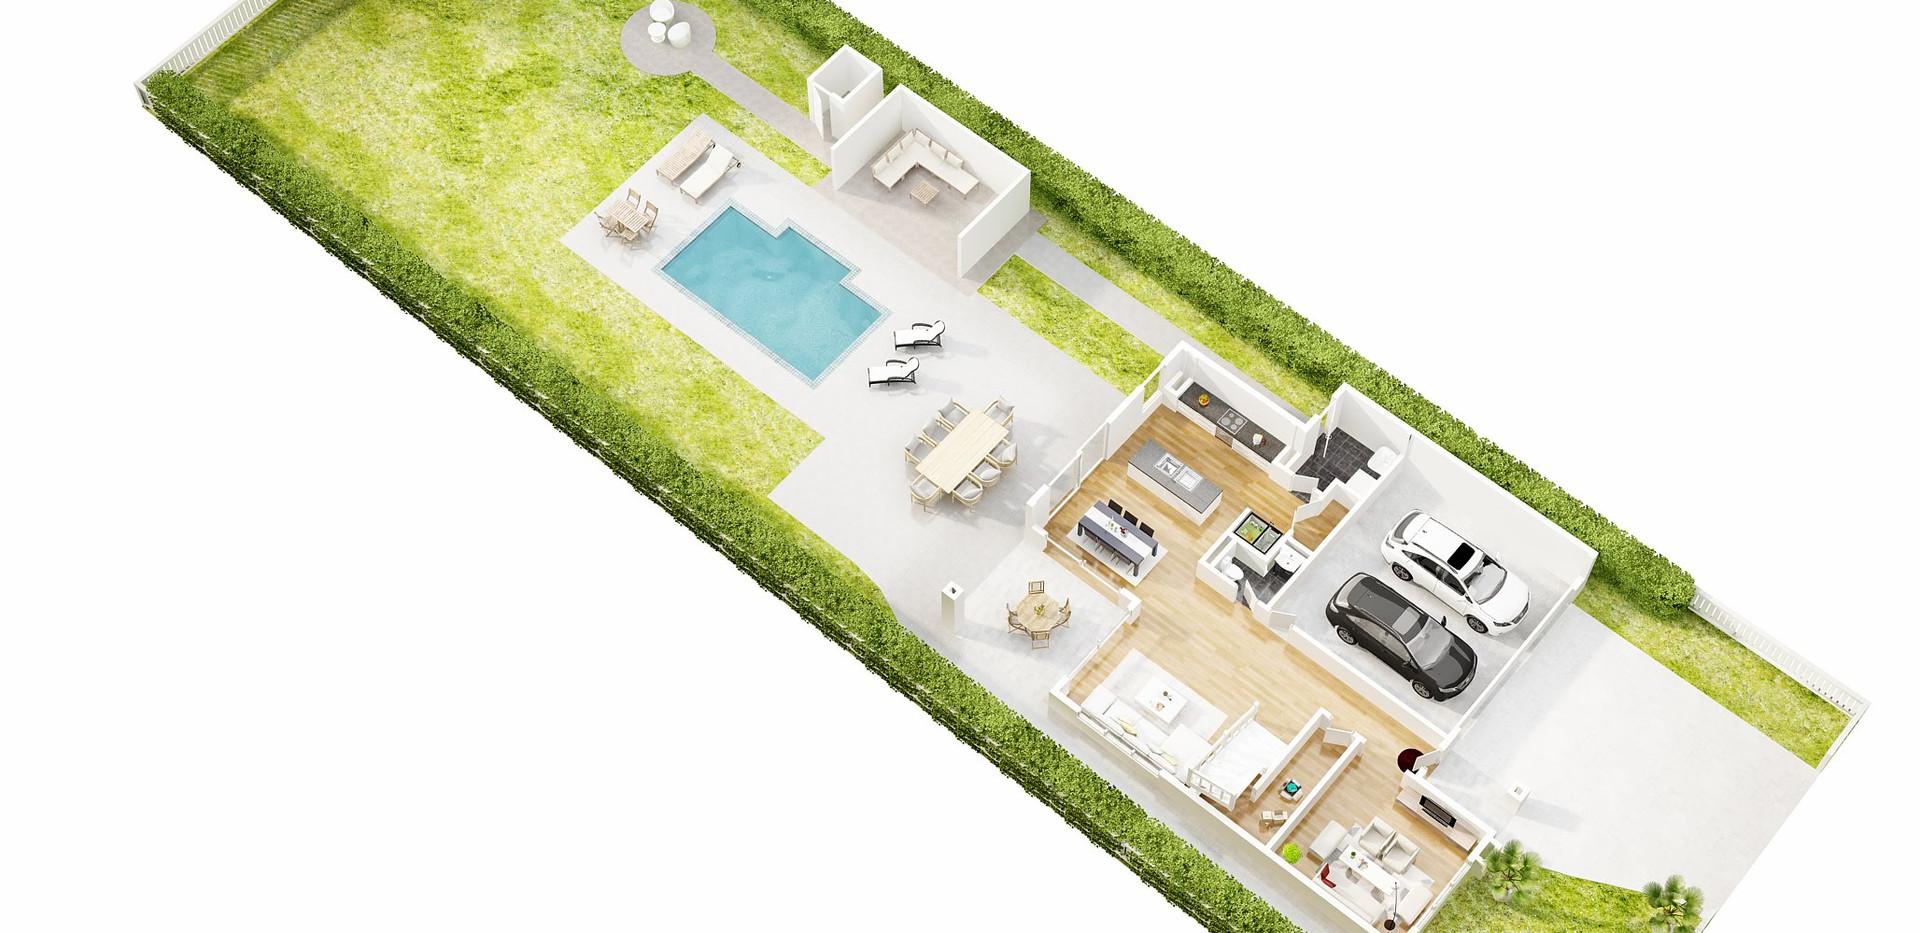 johannafikkers_lanscape_3D  floor plan